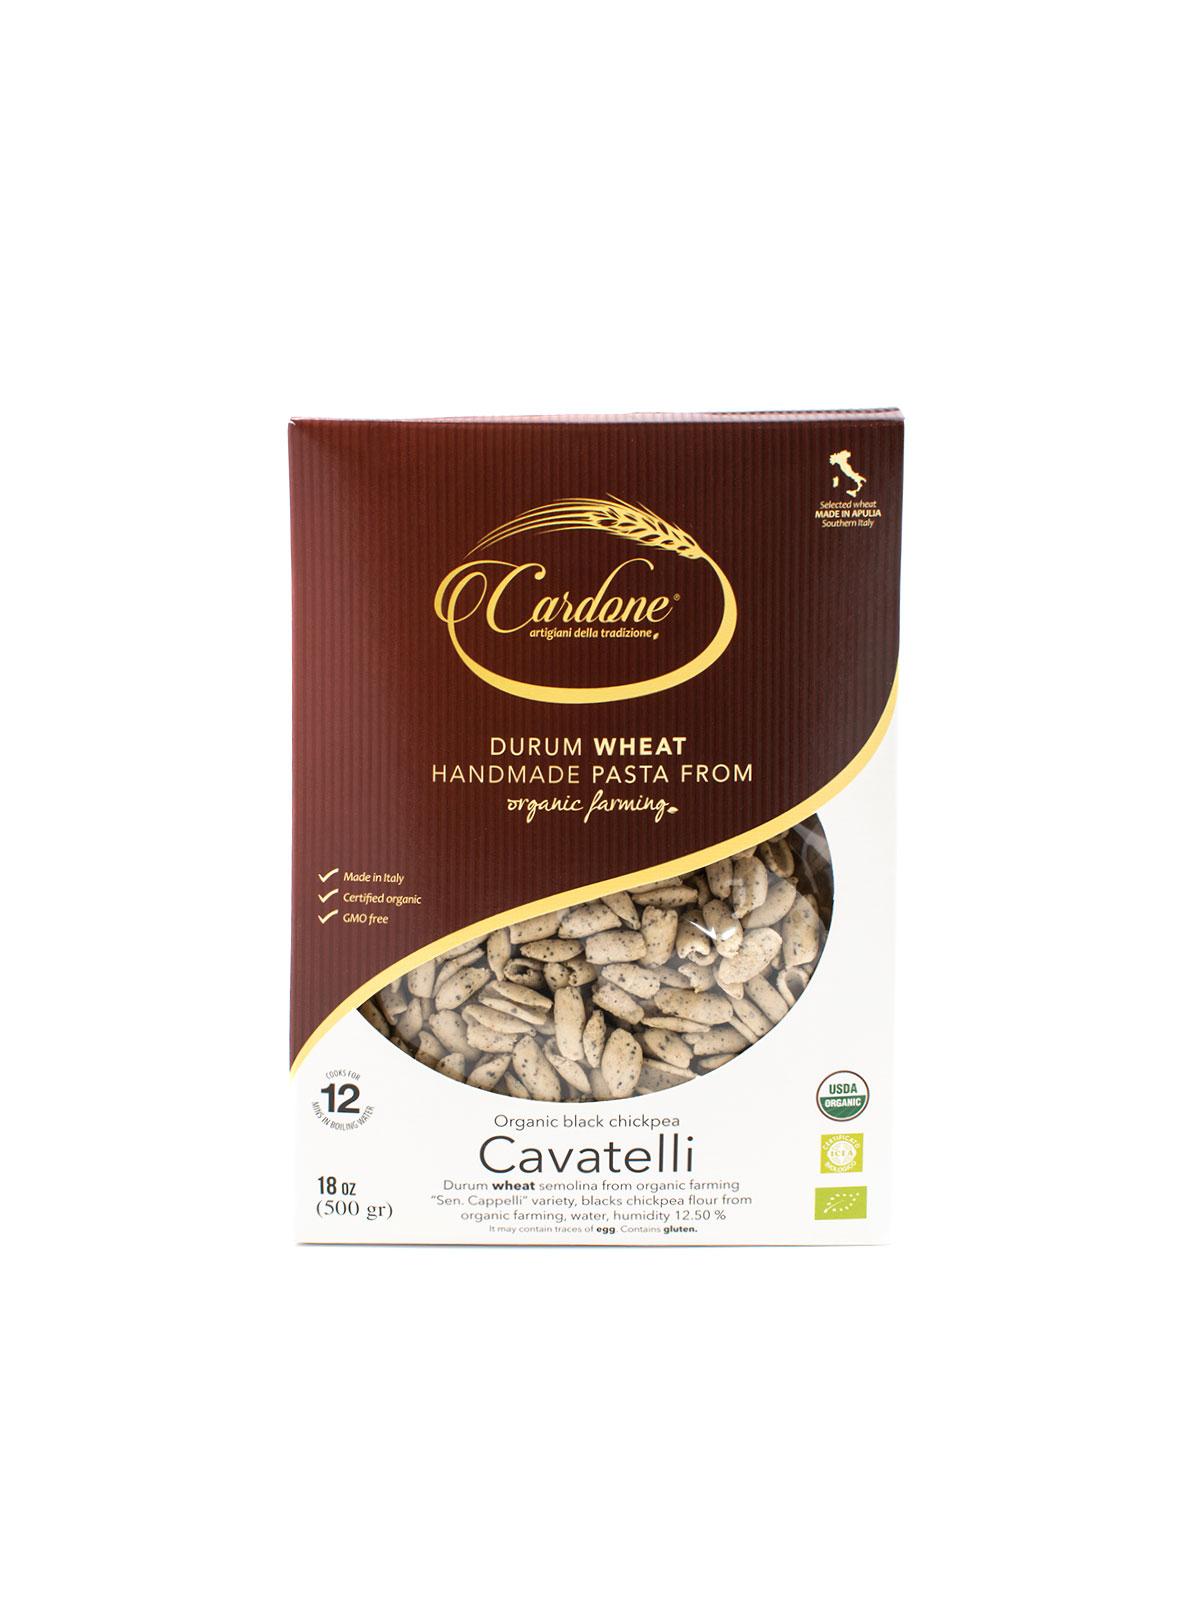 Organic Black Chickpea Cavatelli - Pastas, Rice, and Grains - Buon'Italia